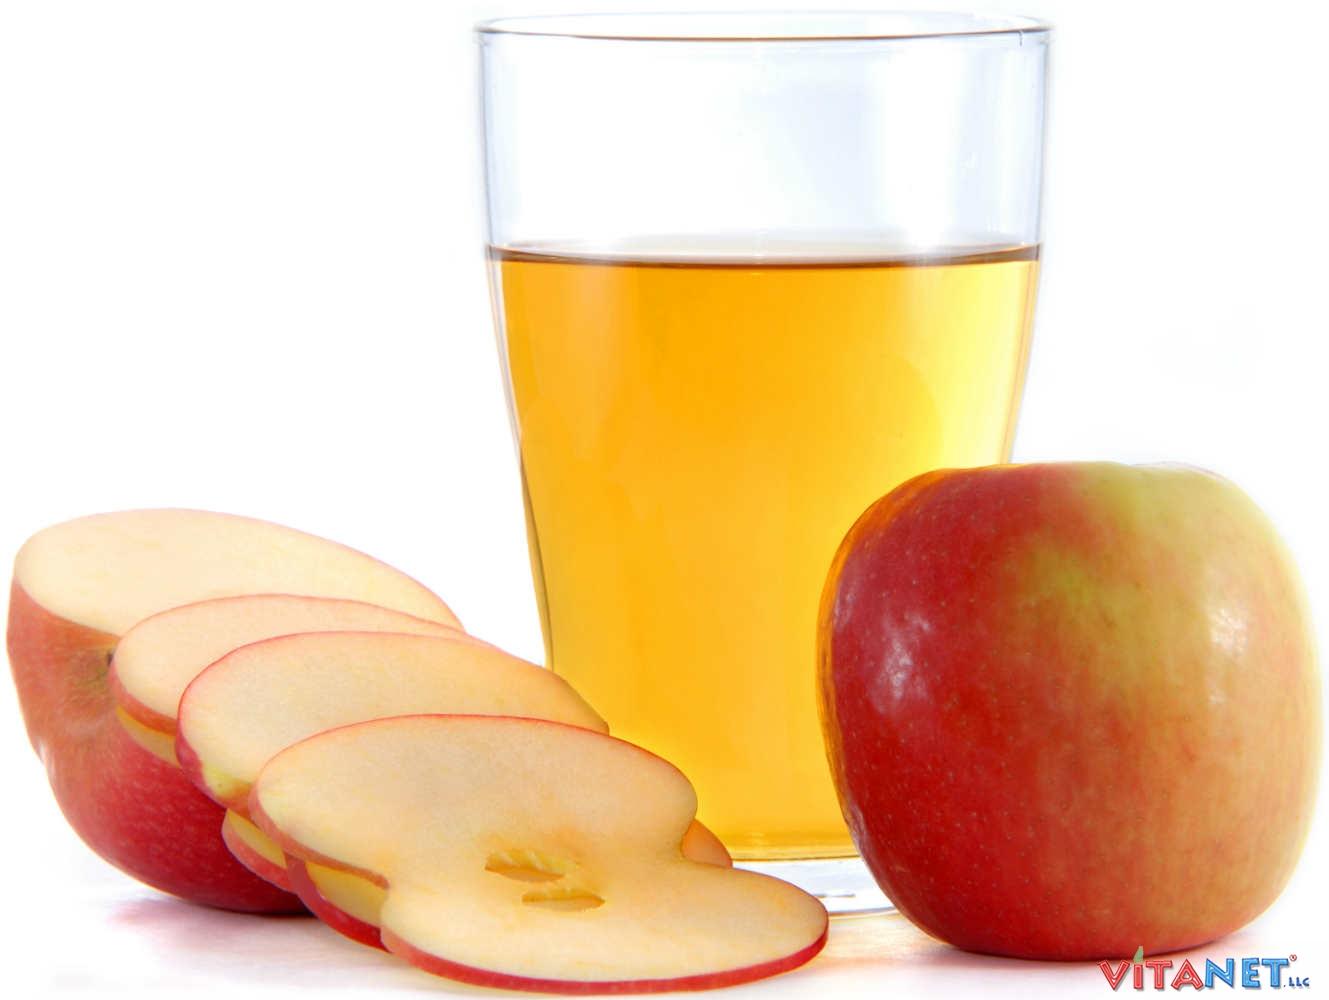 Putting Apple Cider Vinegar To Work For You